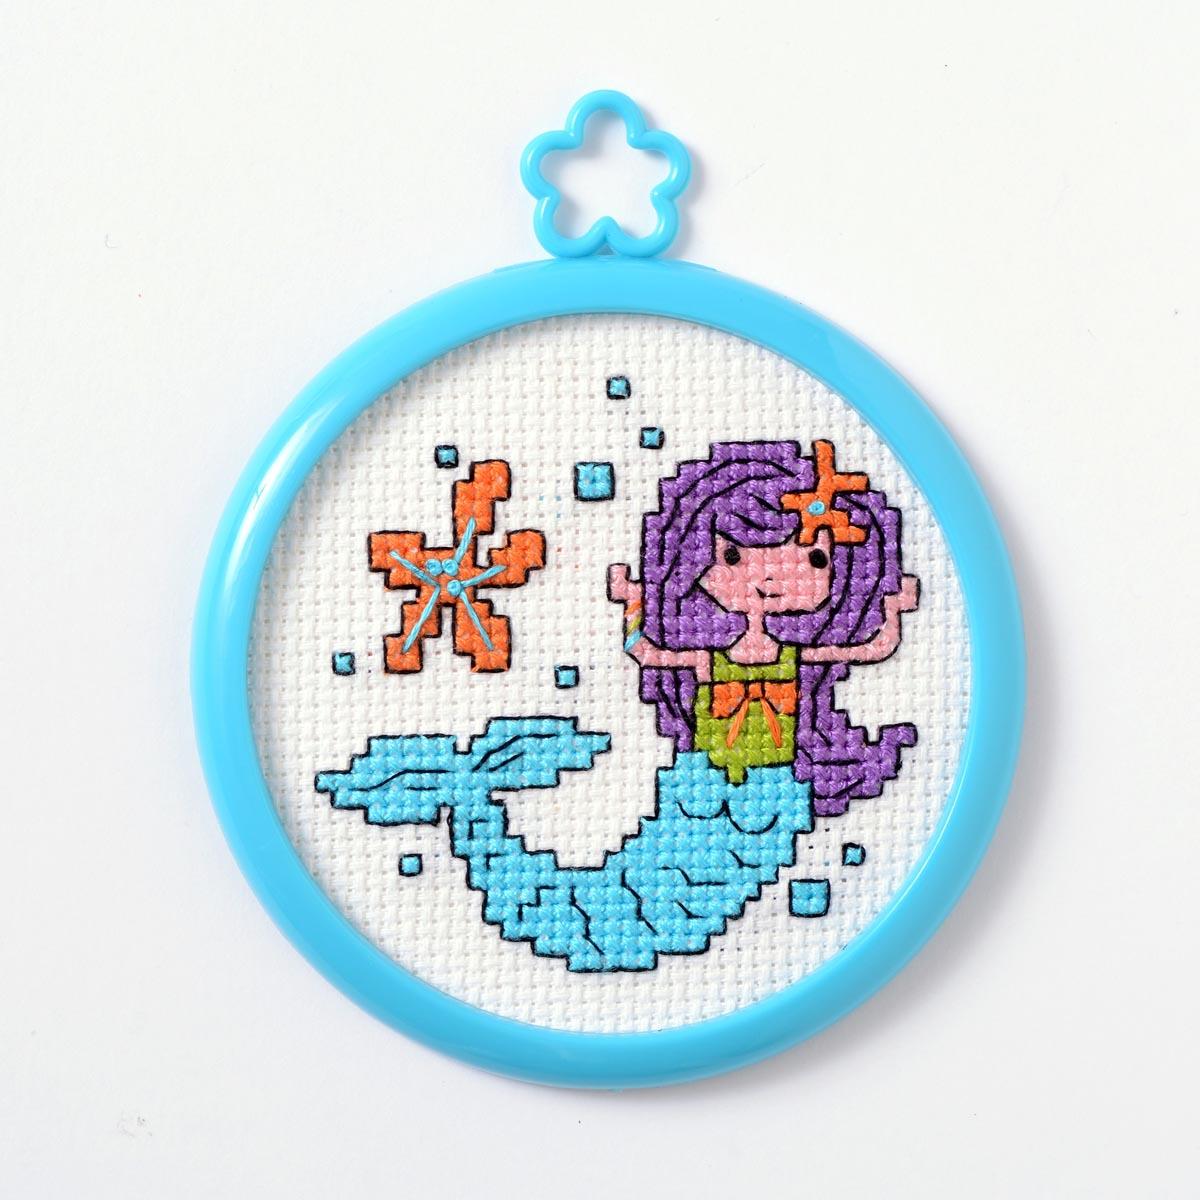 Bucilla ® My 1st Stitch™ - Counted Cross Stitch Kits - Mini - Mermaid